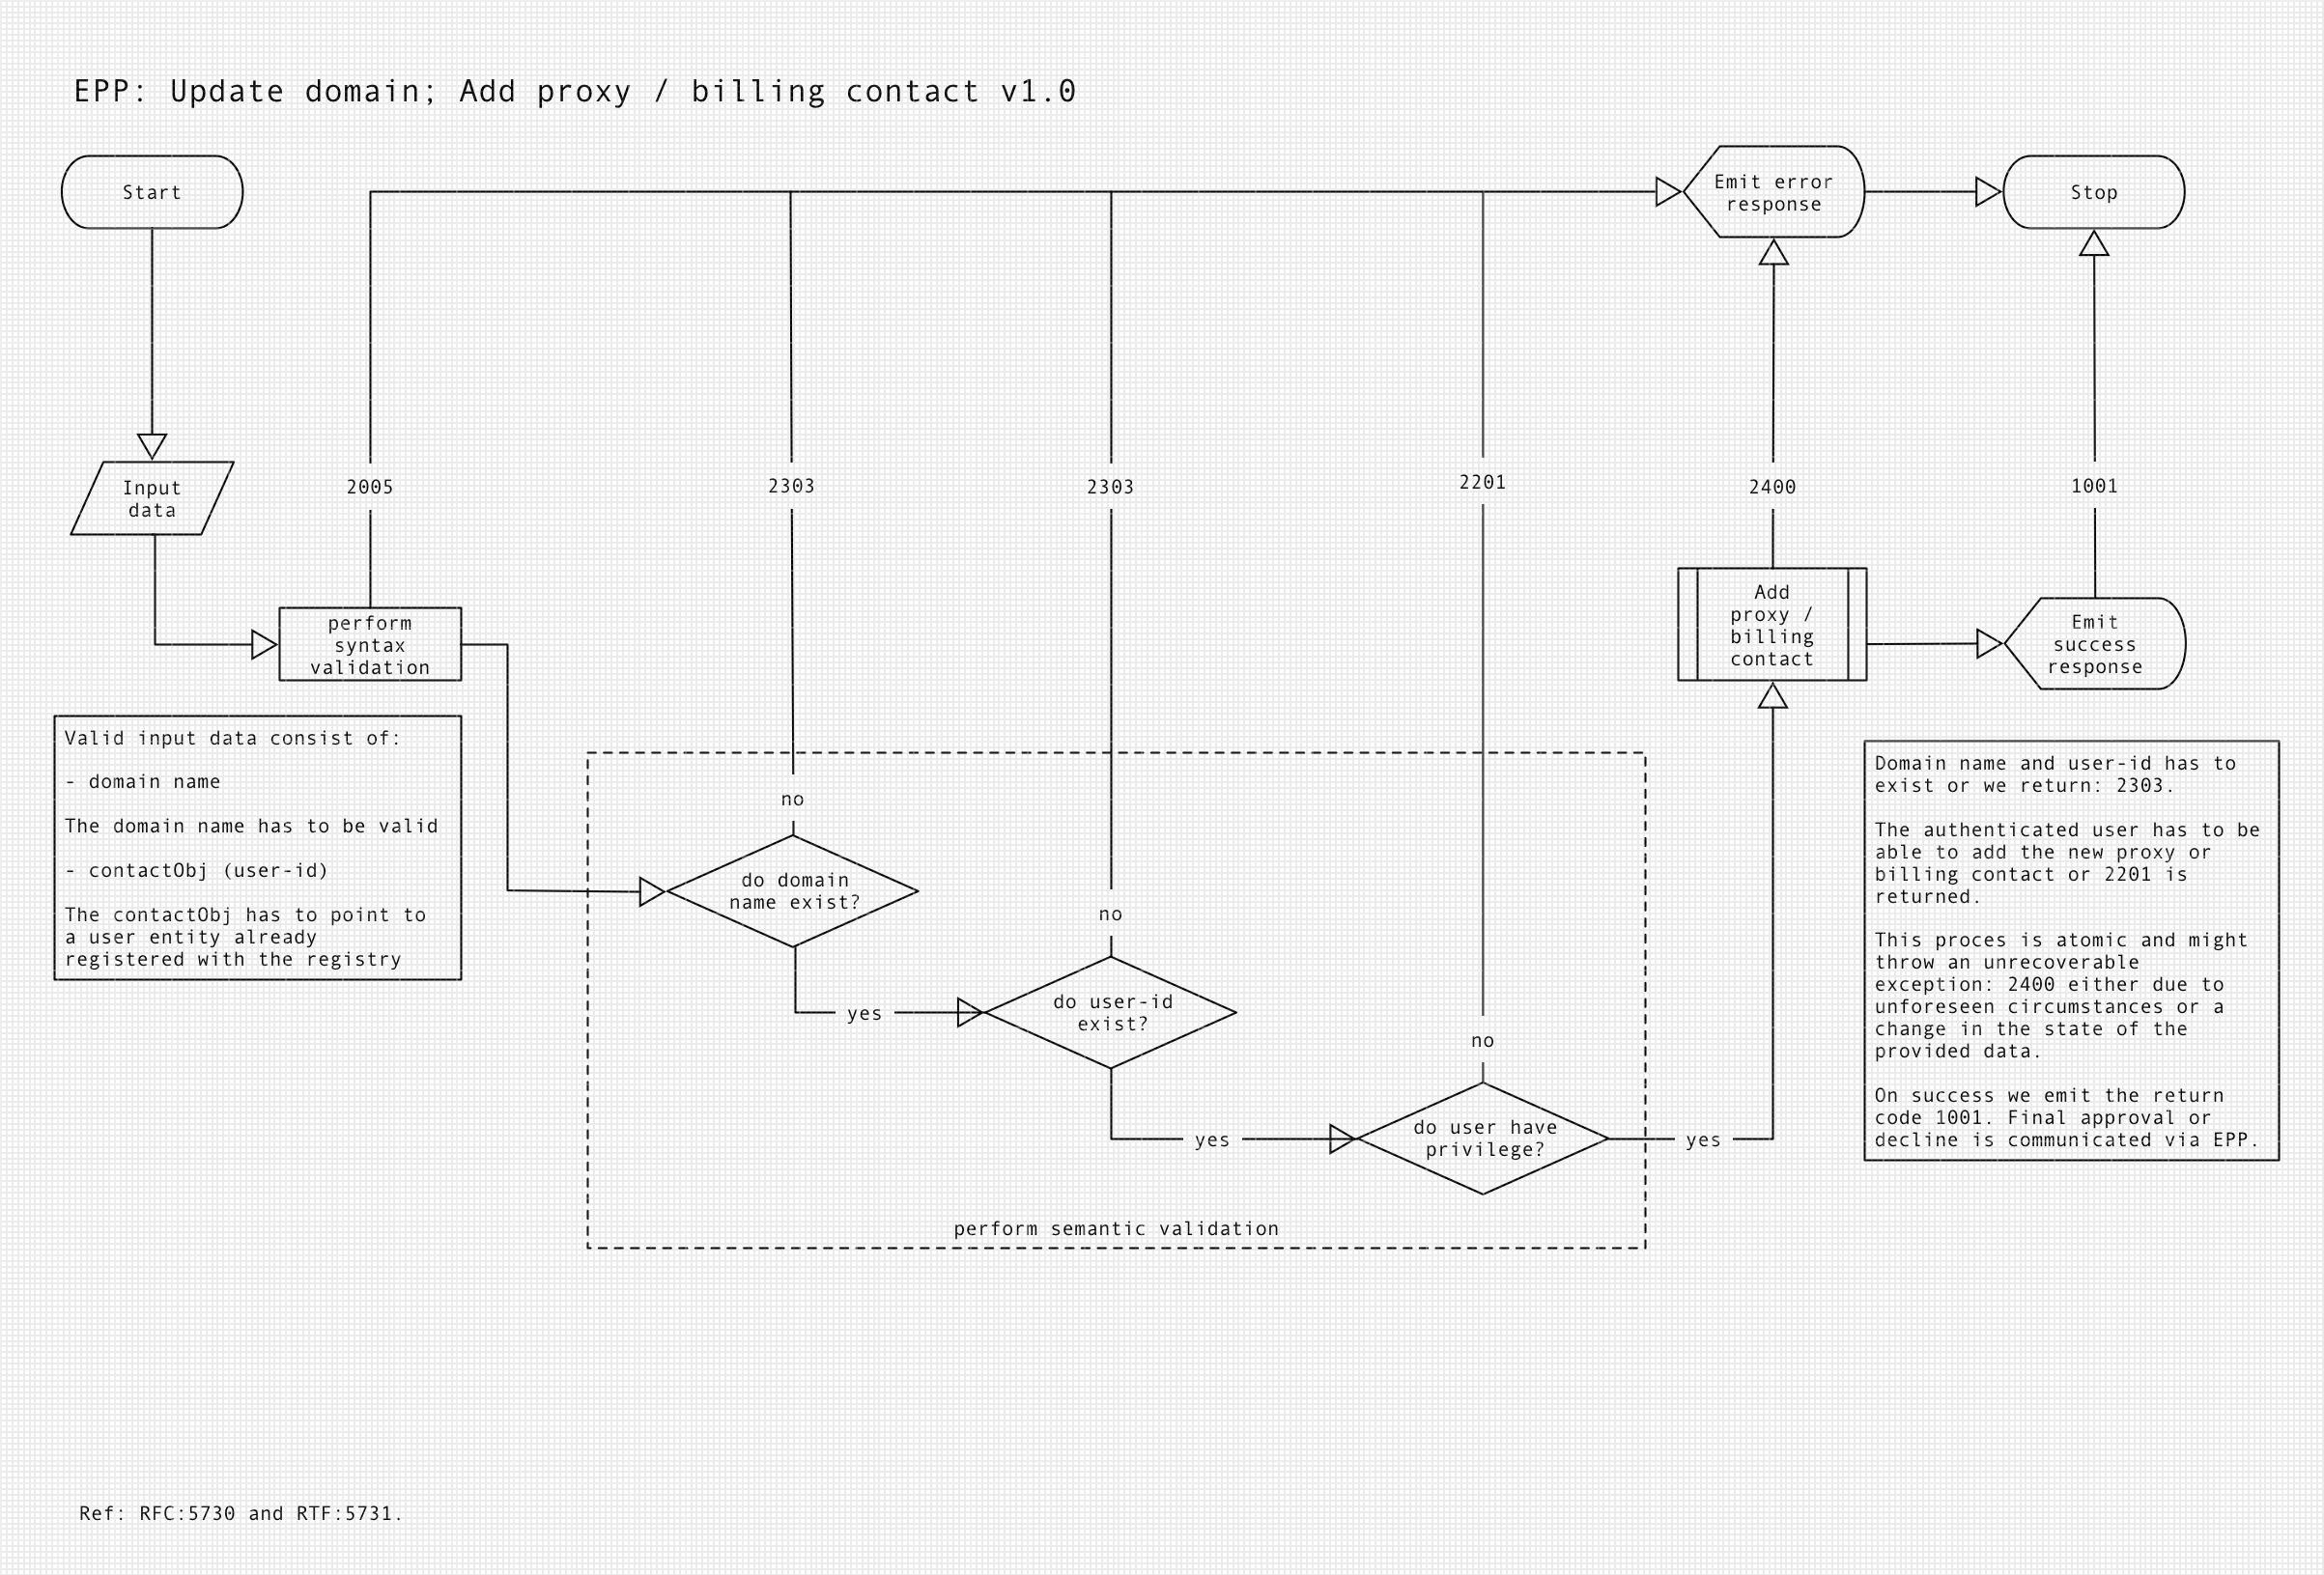 Update domain - Add billing/admin contact